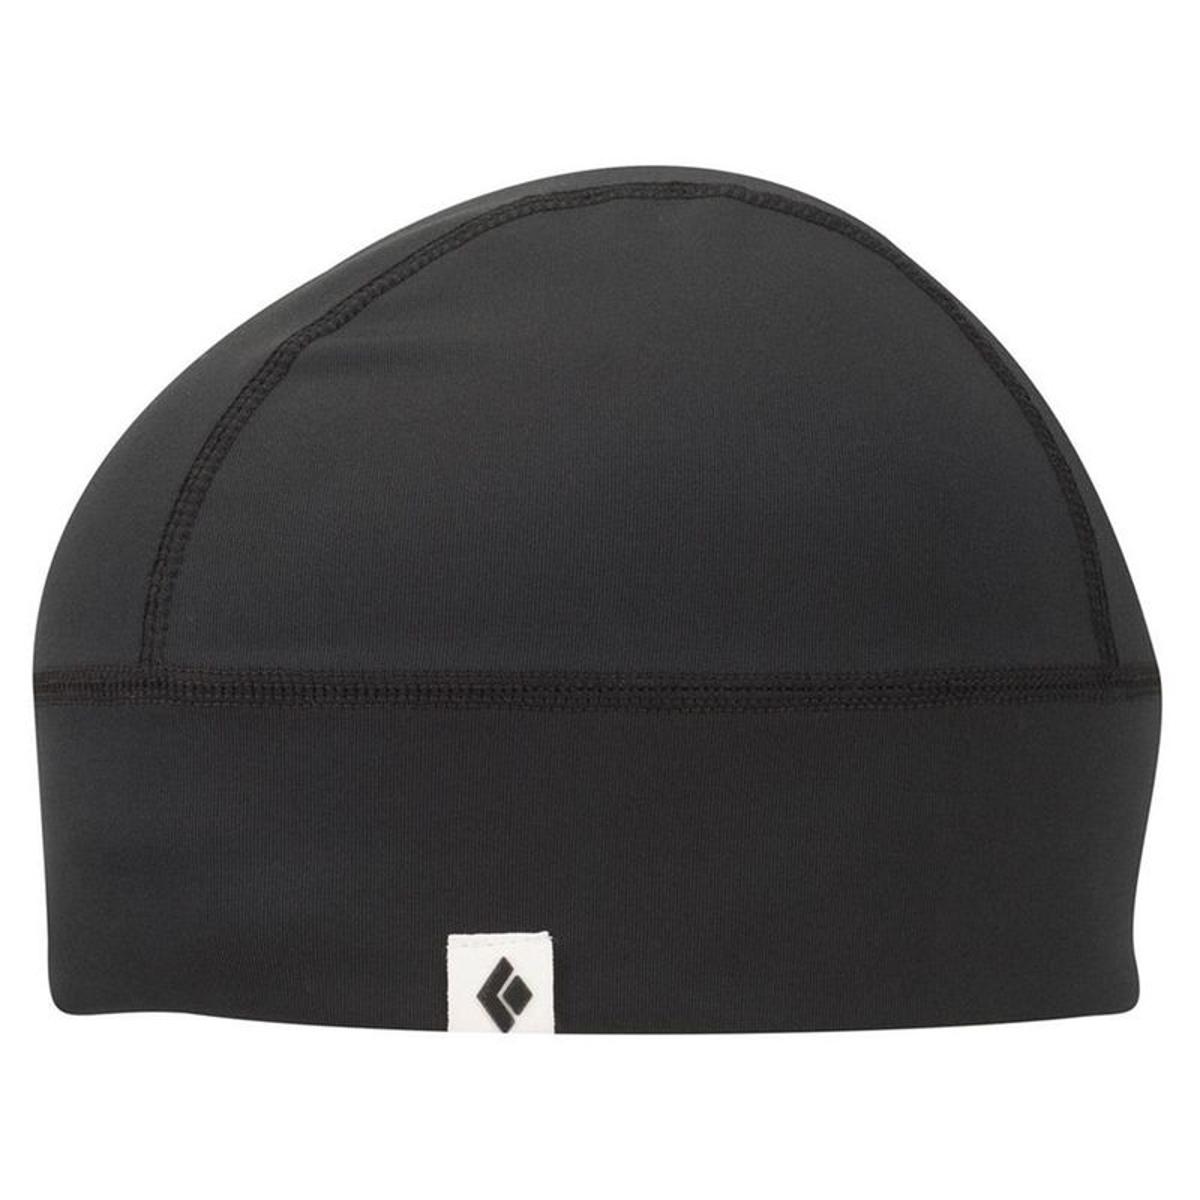 Bonnets Black Diamond Dome Beanie